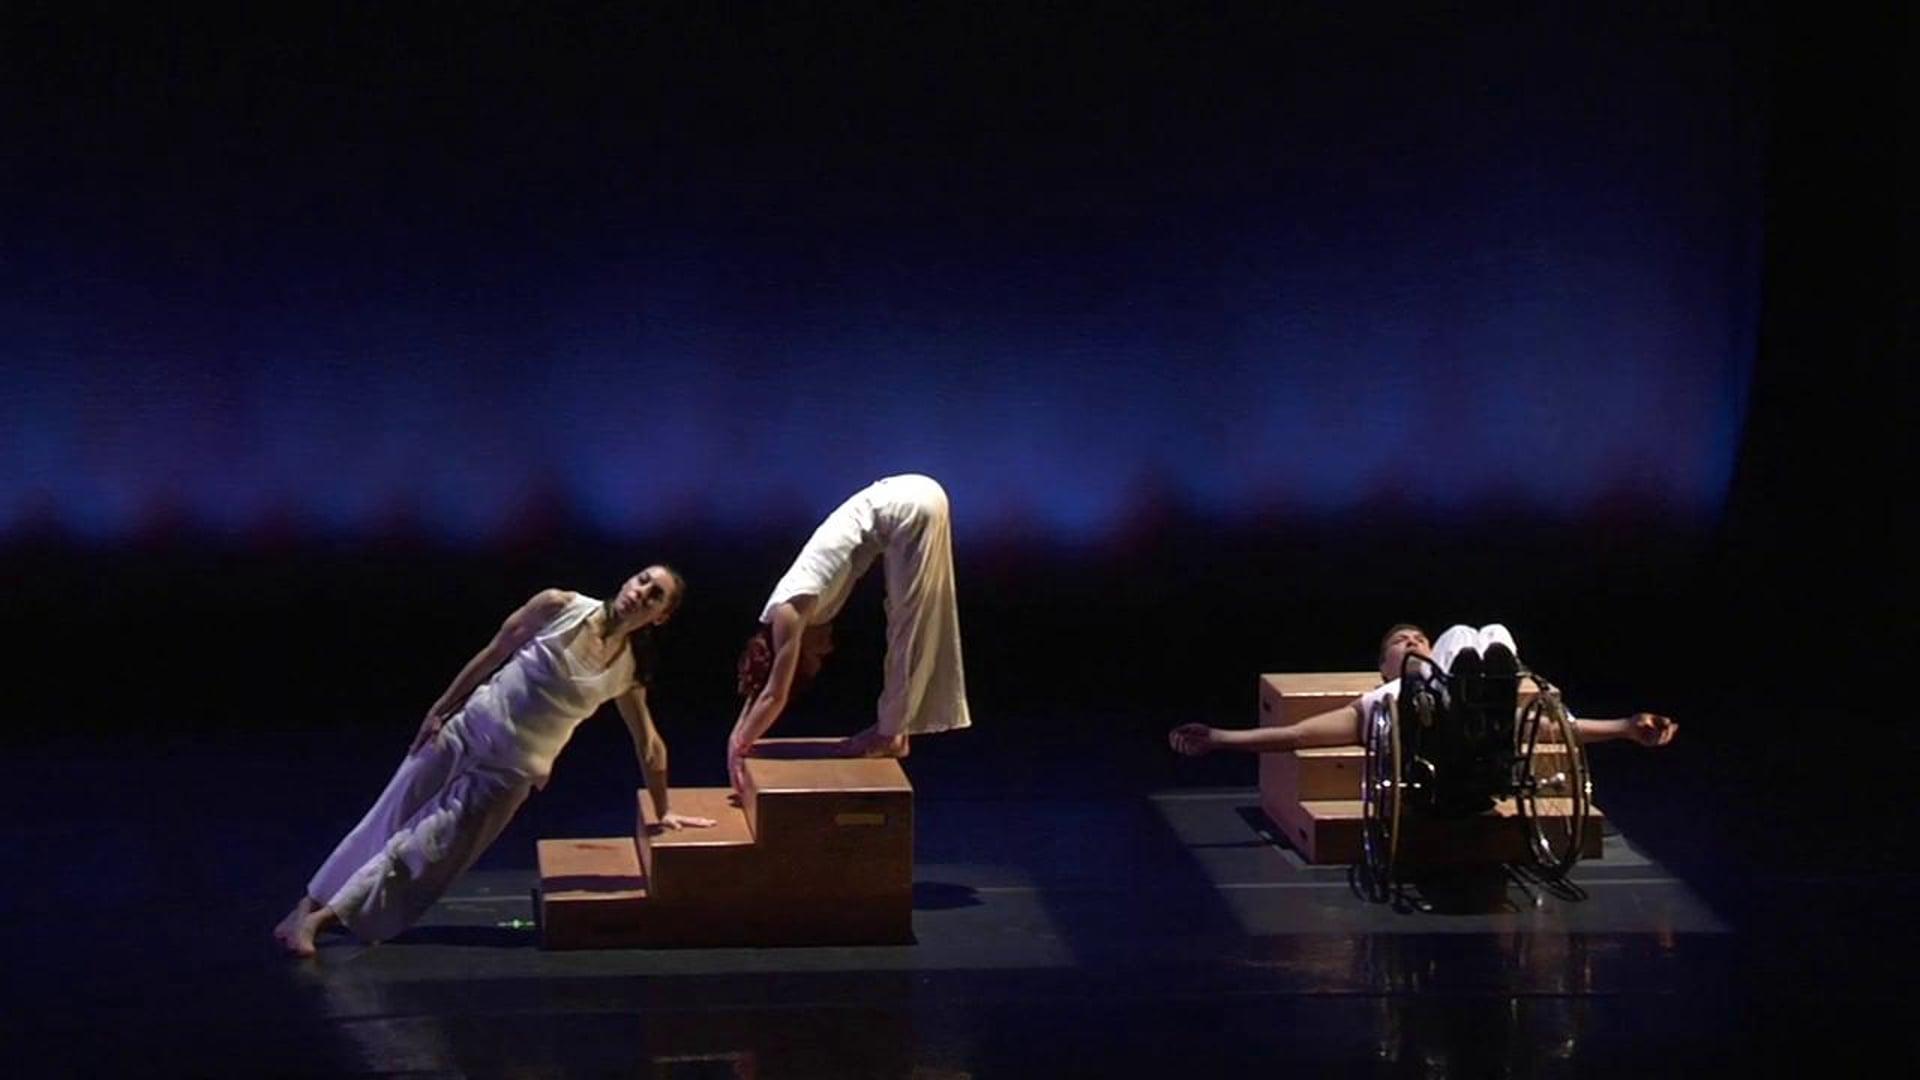 Stair Dance (excerpt )